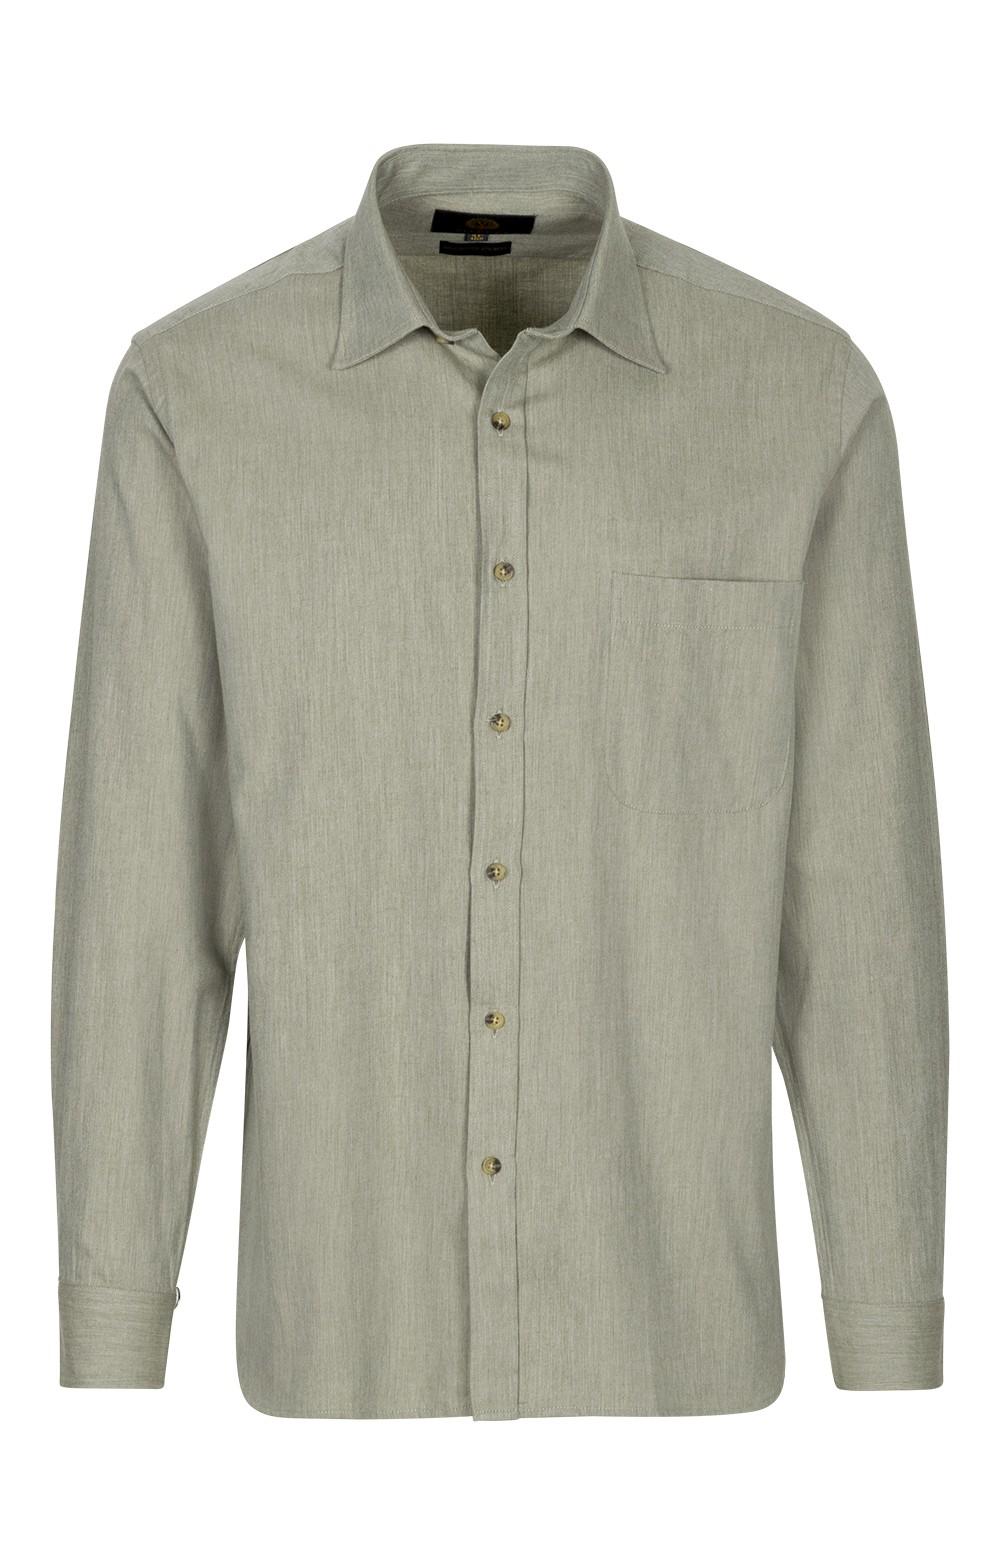 ad7cabafc Men's Viyella Cotton/Wool Blend Shirt